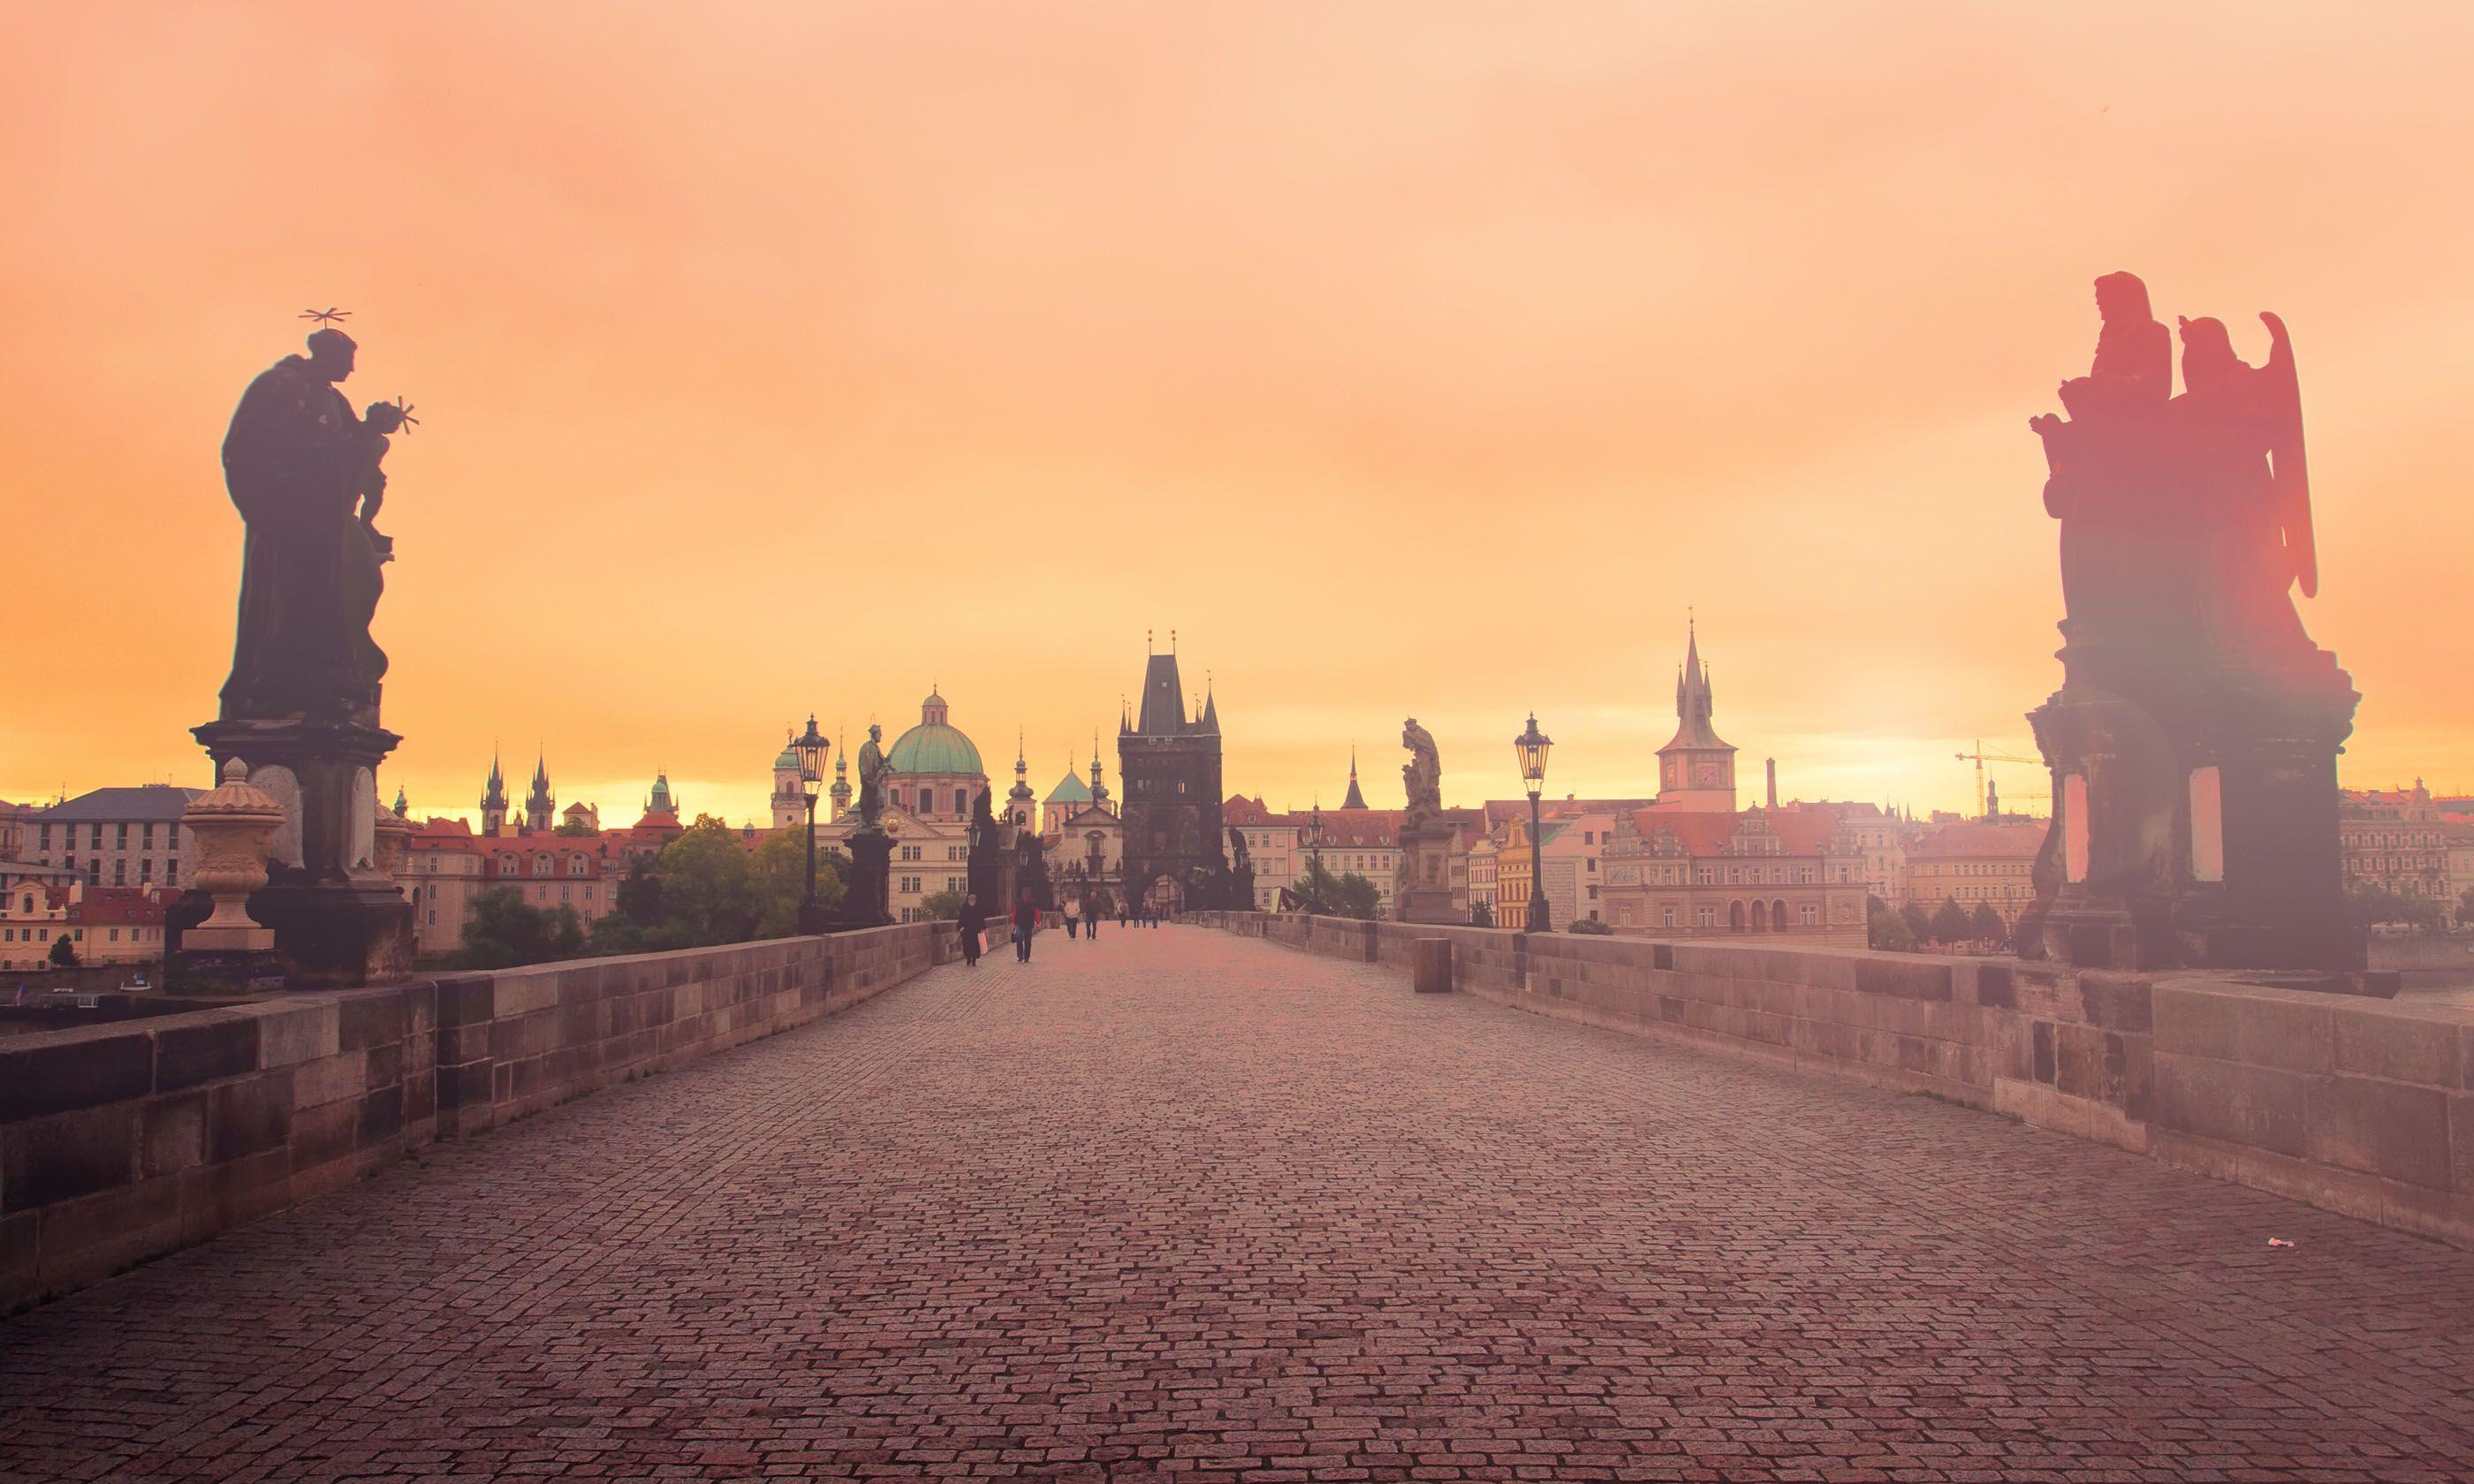 Charles Bridge at dawn (Shutterstock.com)